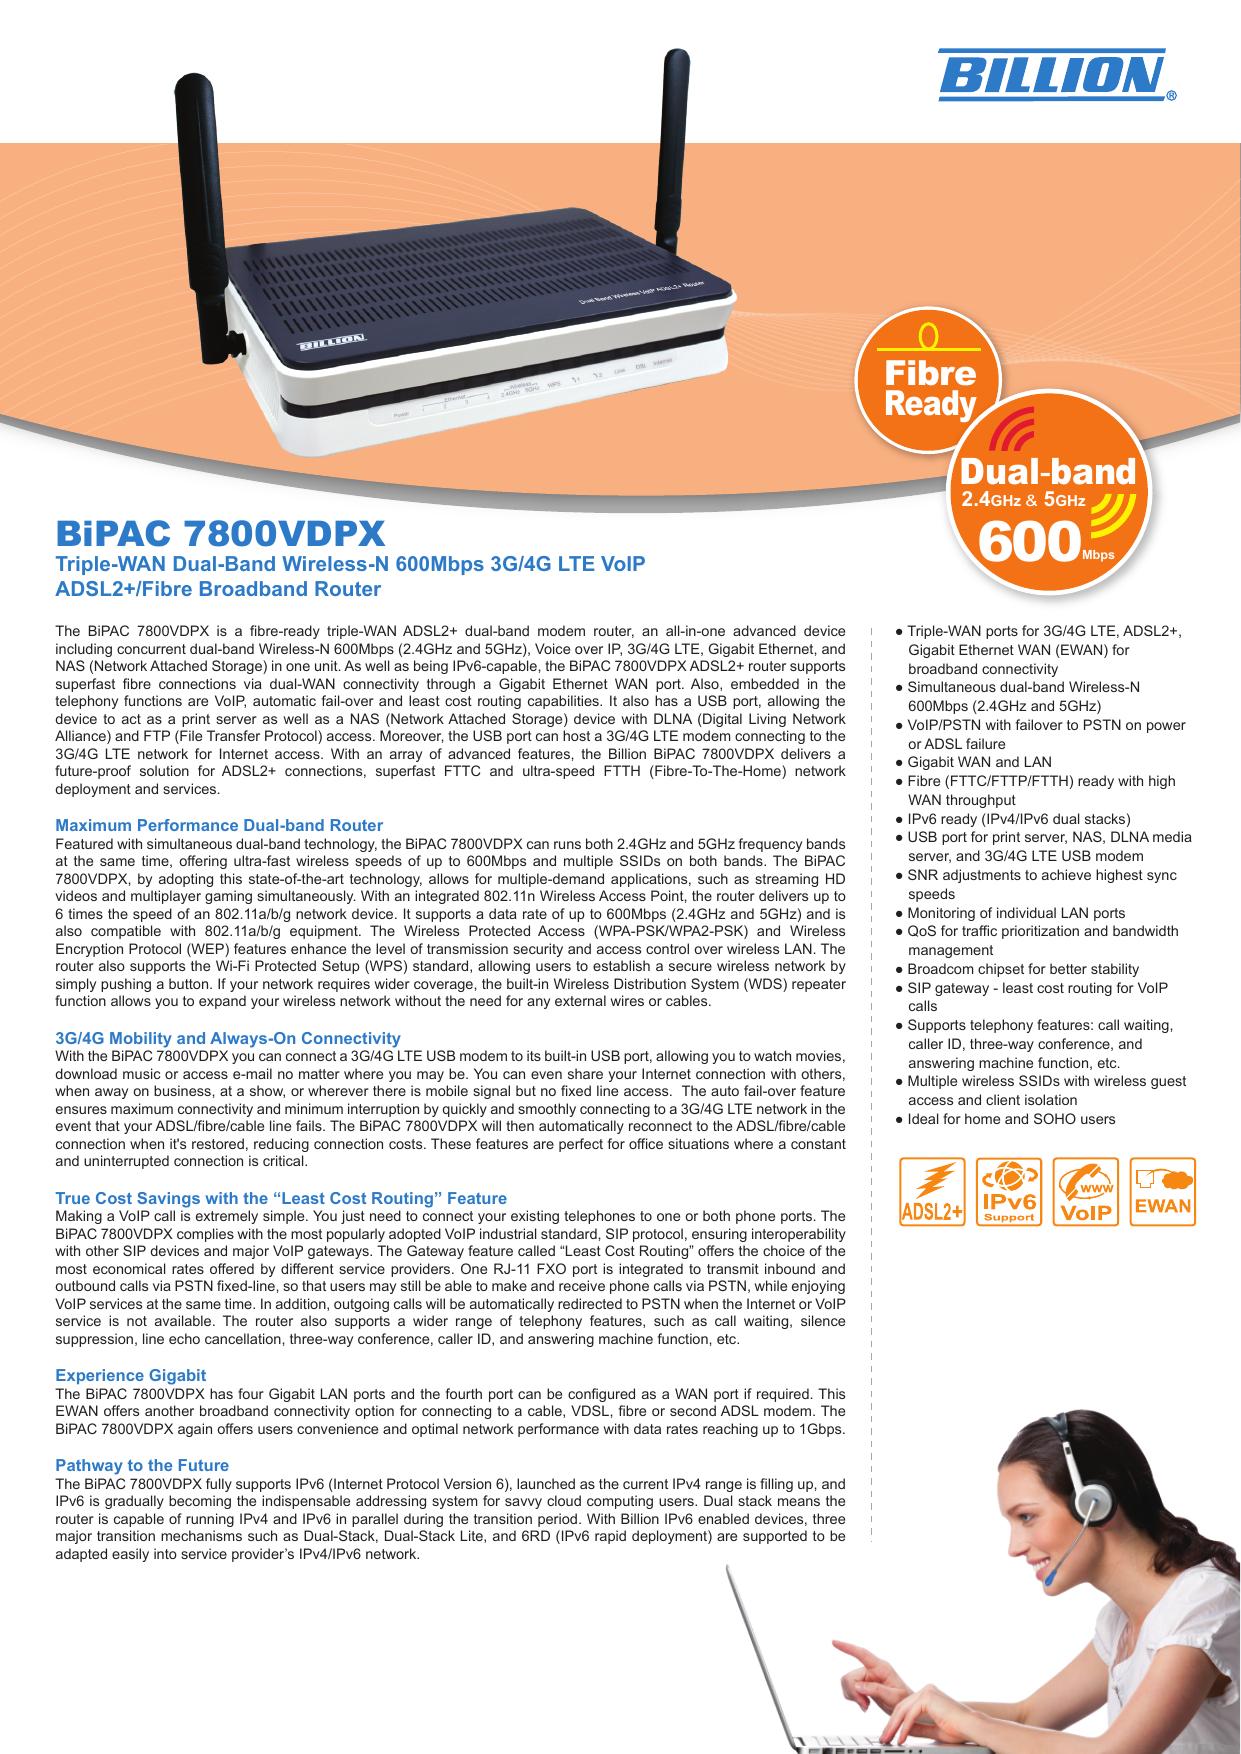 //Fi Billion 7800VDOX Triple-WAN Dual Band Wireless-N 600 Mbps 3G//LTE VoIP ADSL2